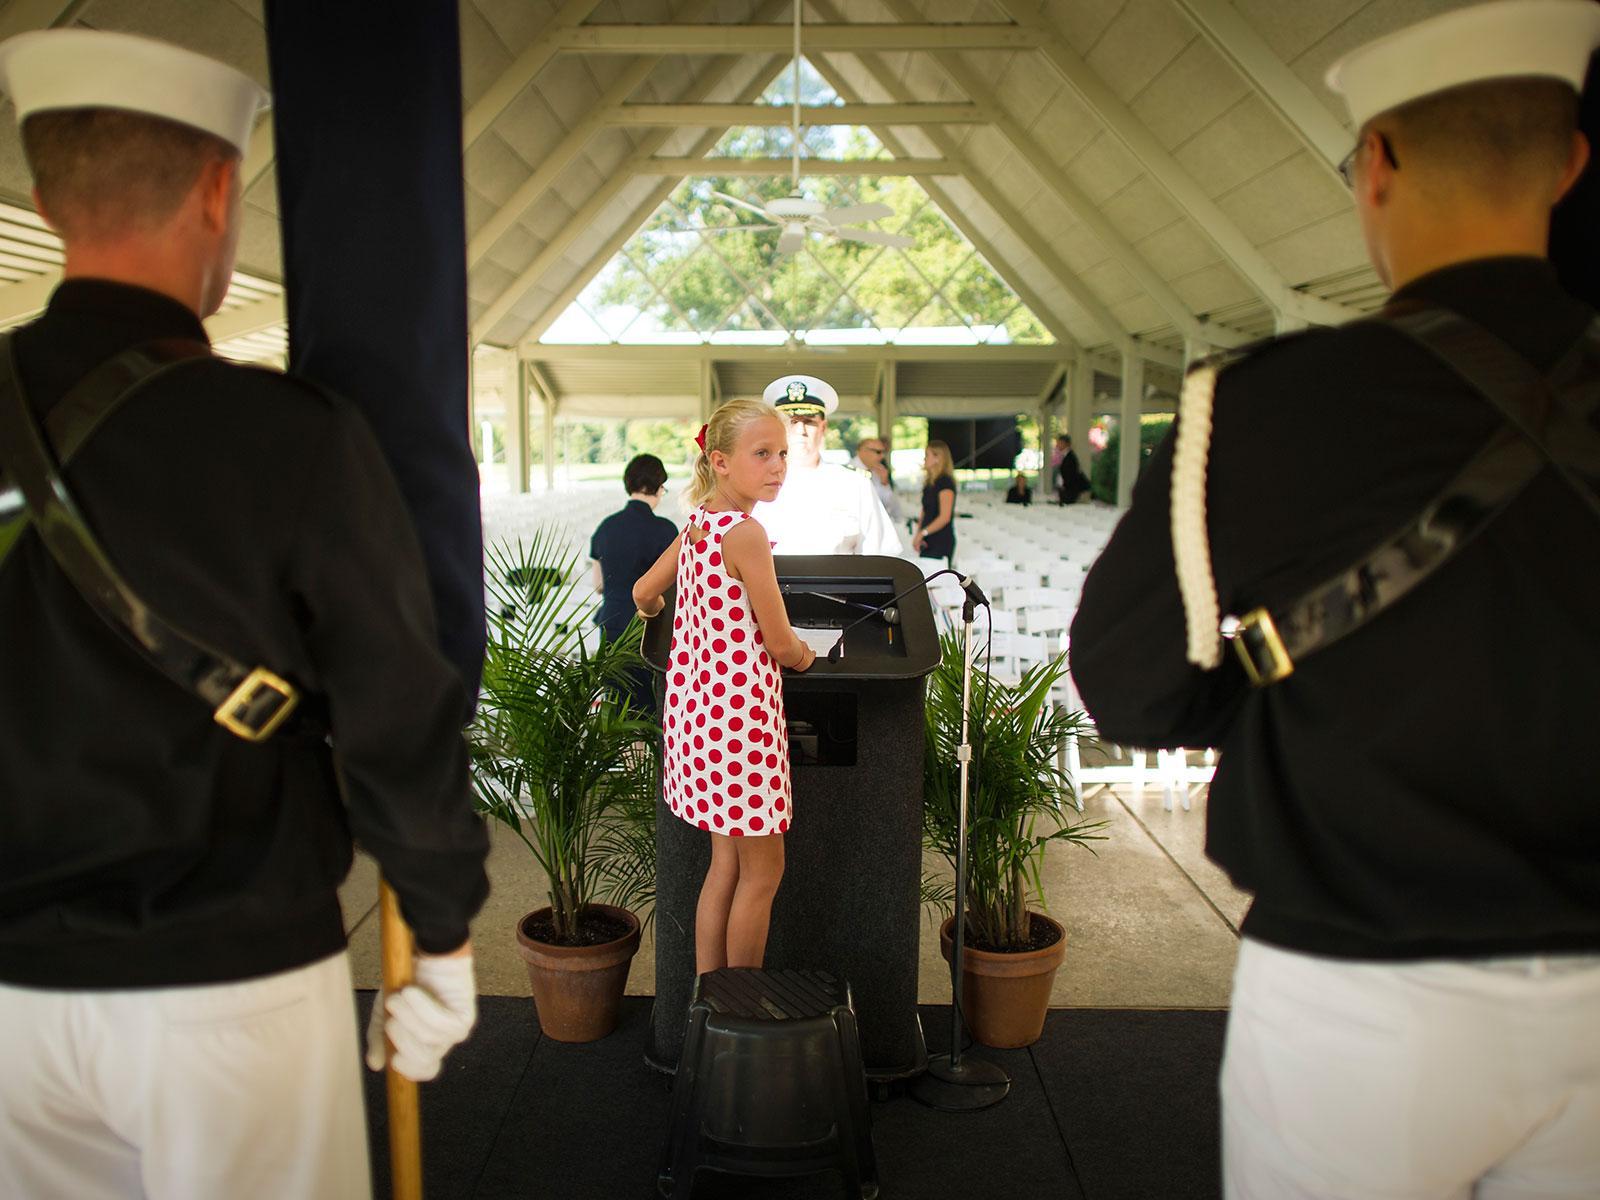 Neil Armstrong Memorial: Granddaughter